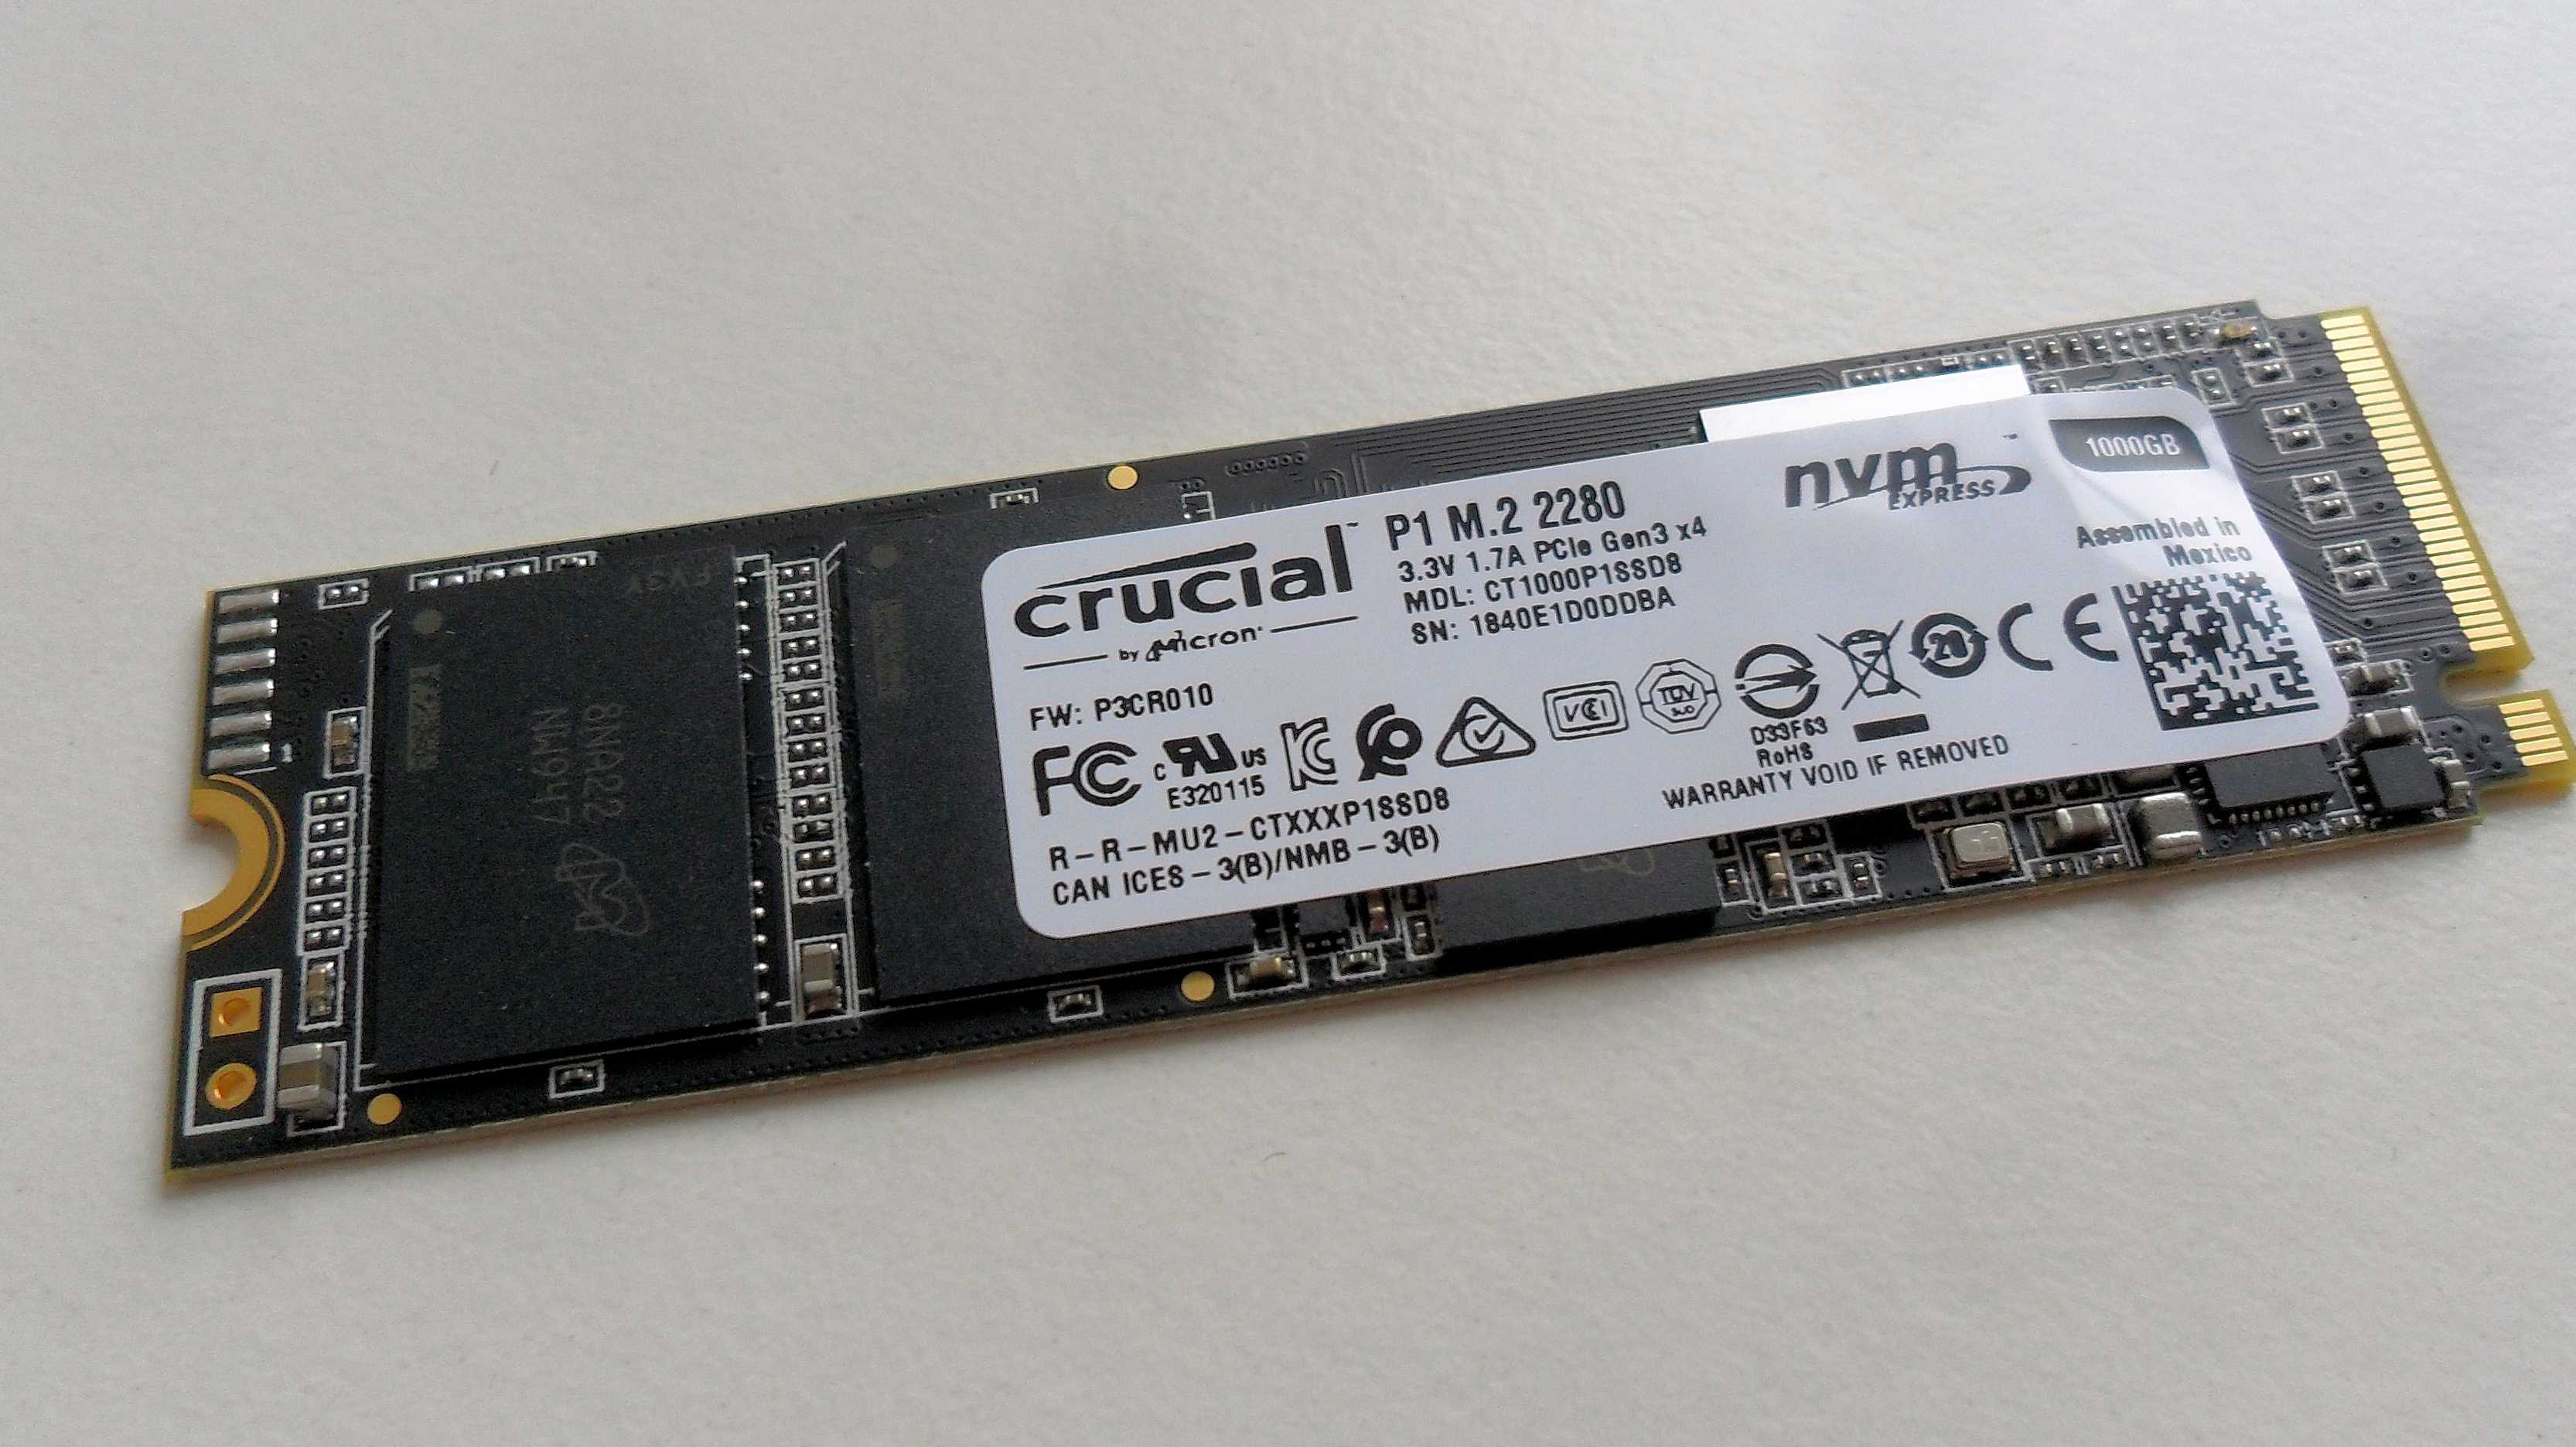 Crucial bringt PCIe-SSD mit QLC-Flash